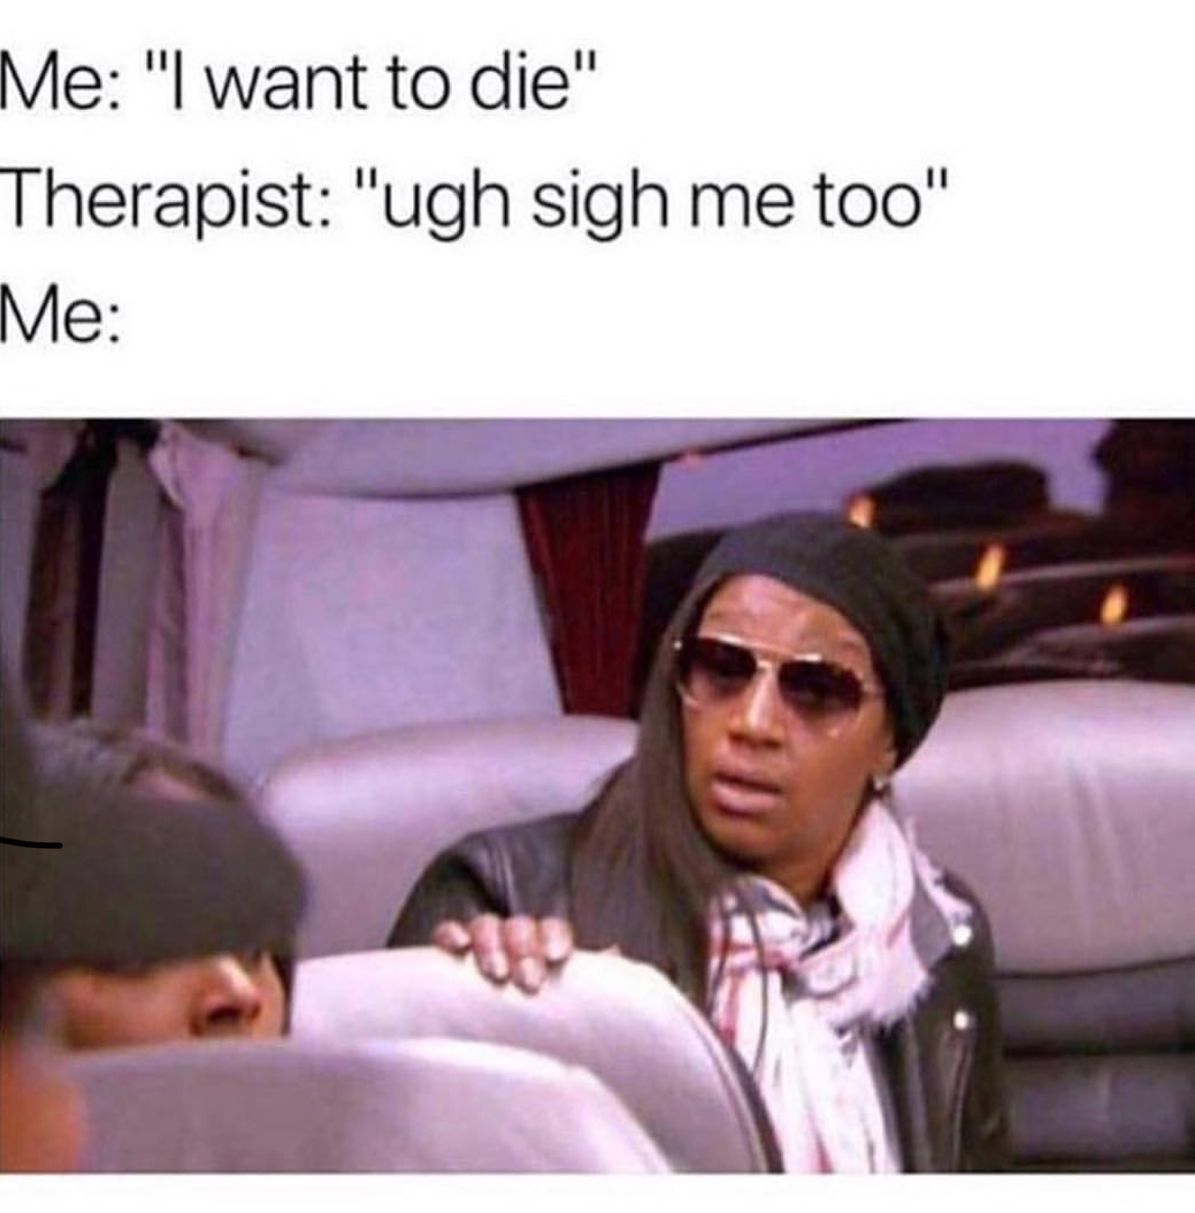 i do want to die tho - meme